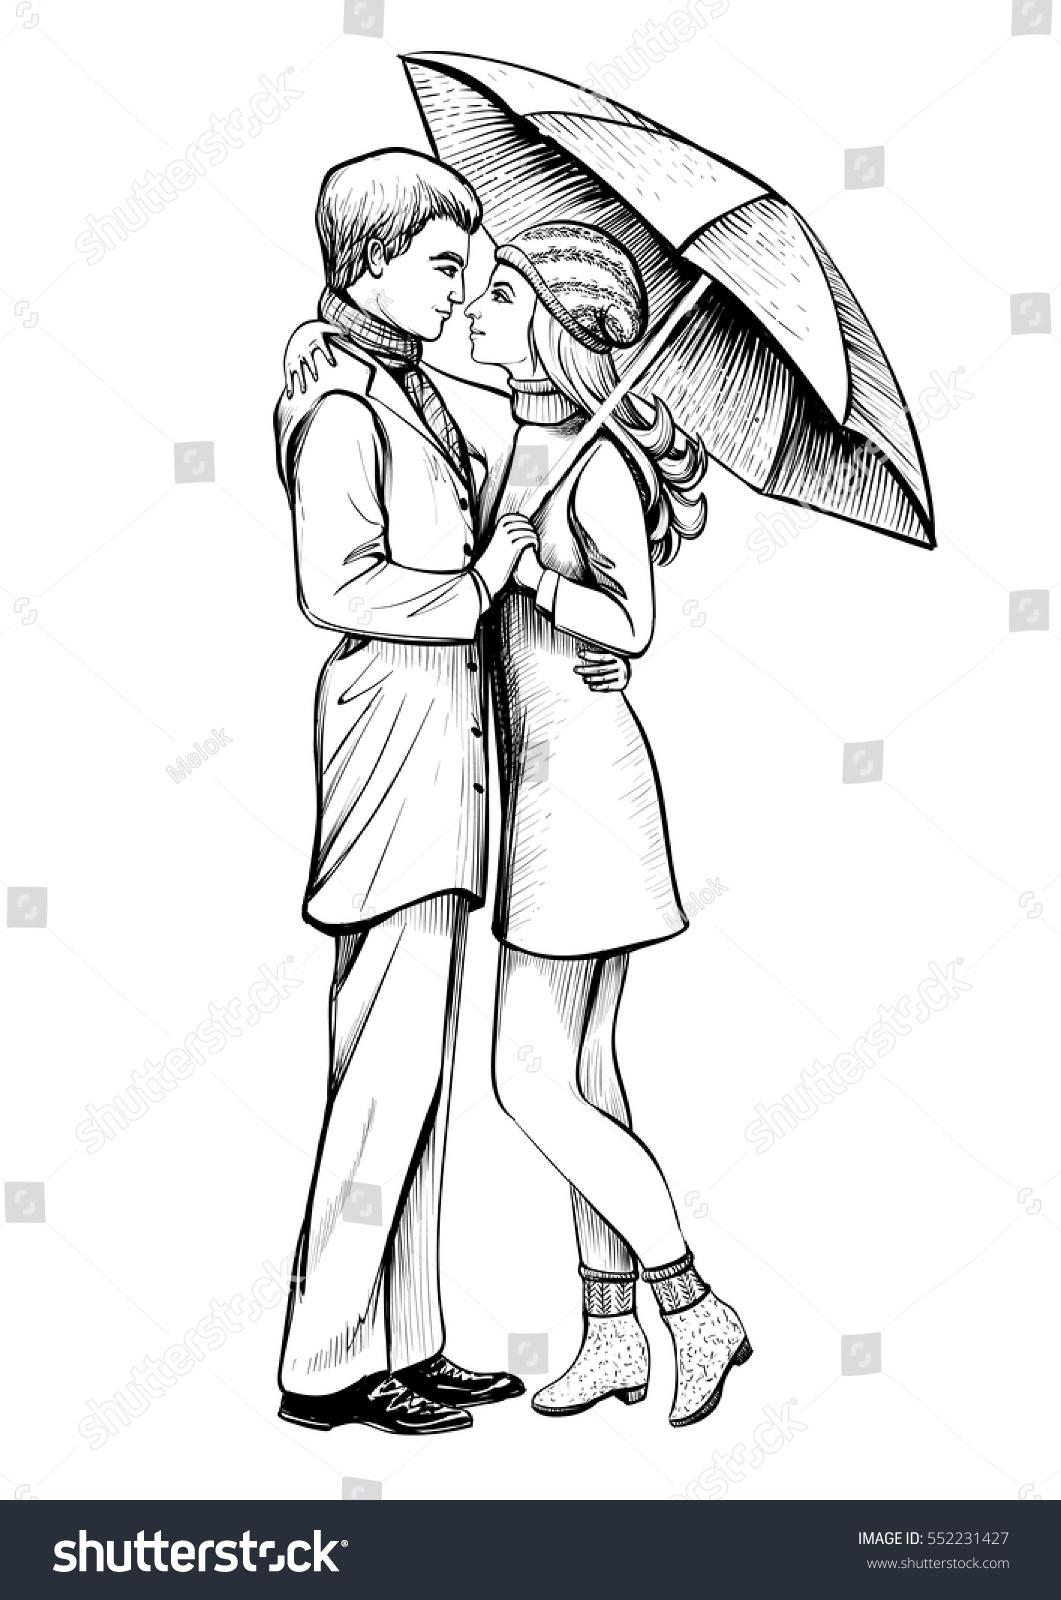 Couple in love under umbrella black and white hand drawn sketch romantic scene with